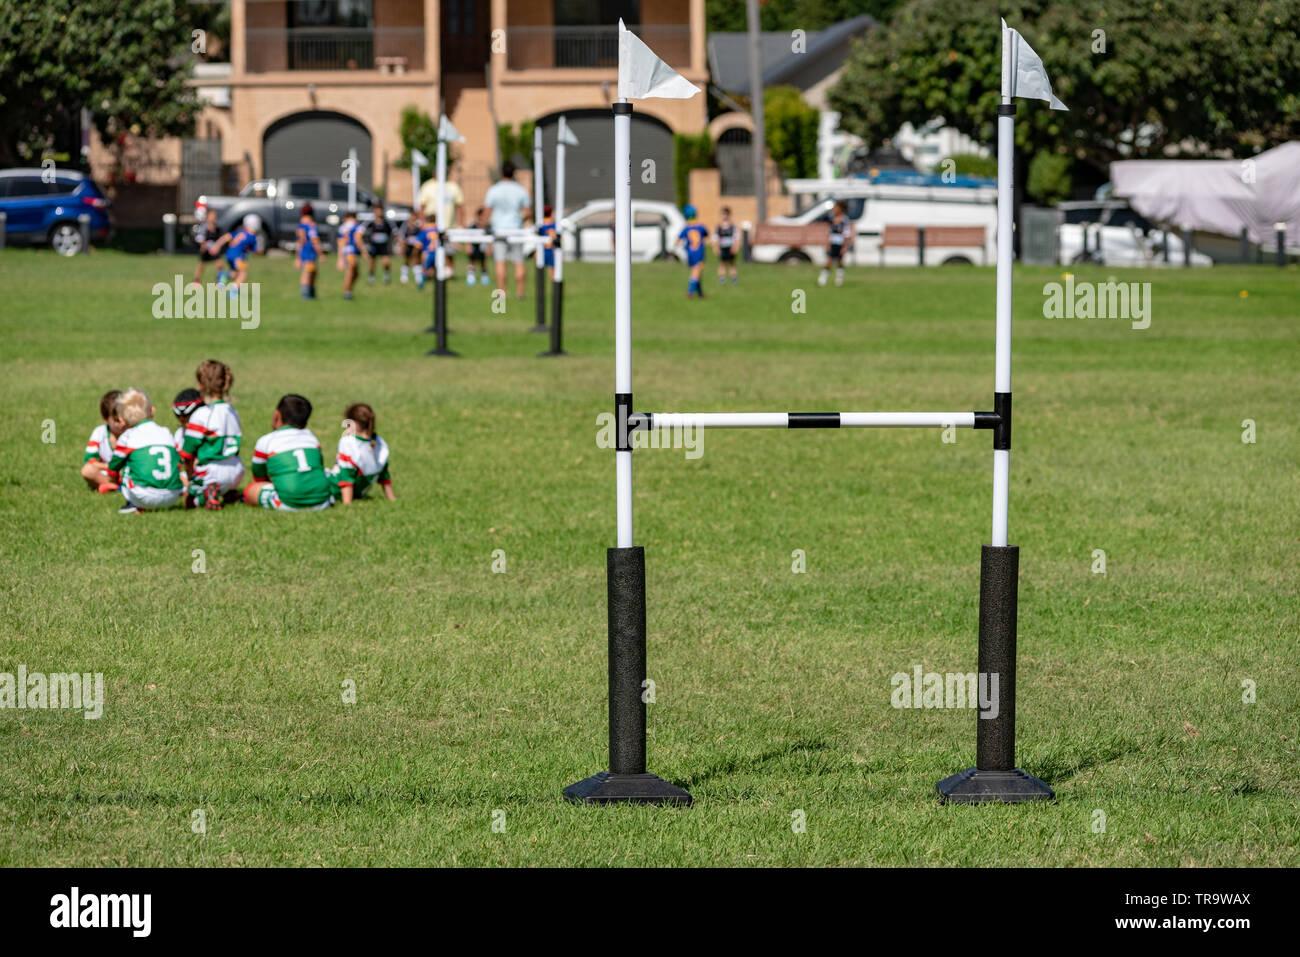 kids Australian football game half-time meeting - Stock Image